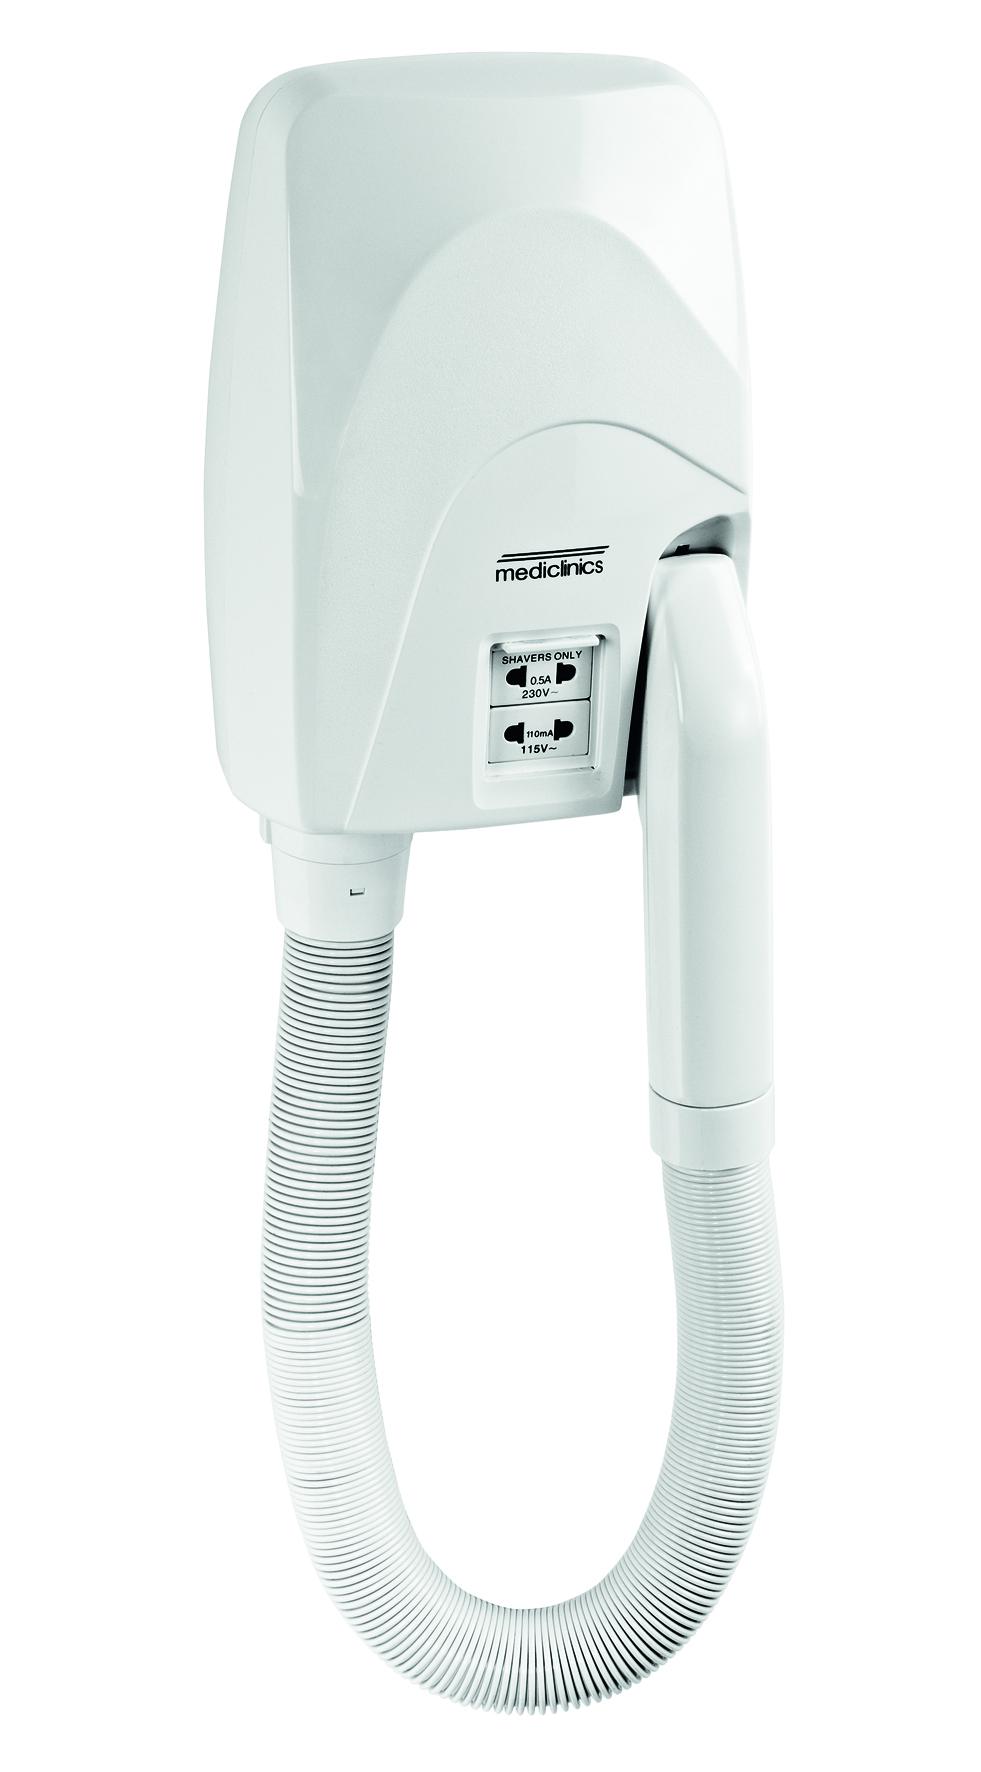 Mediclinics Bathroom Hair Dryer with